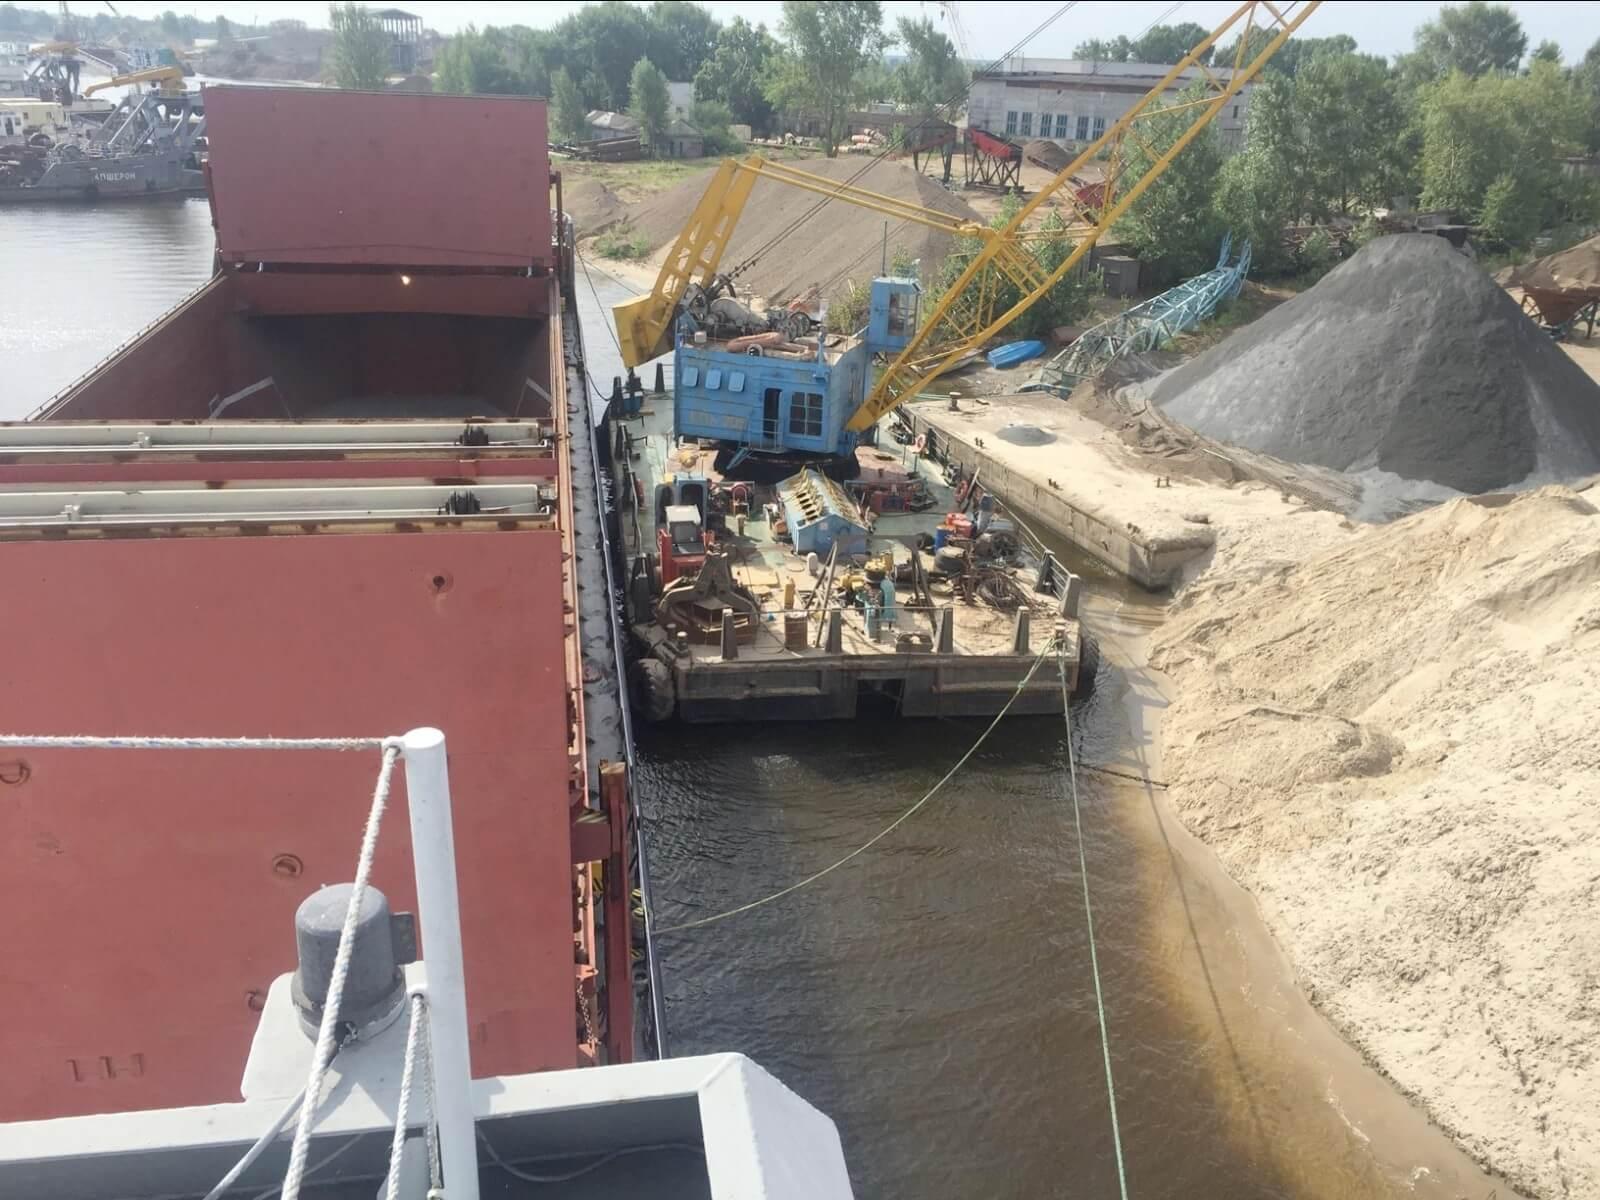 Shipment of crushed stone